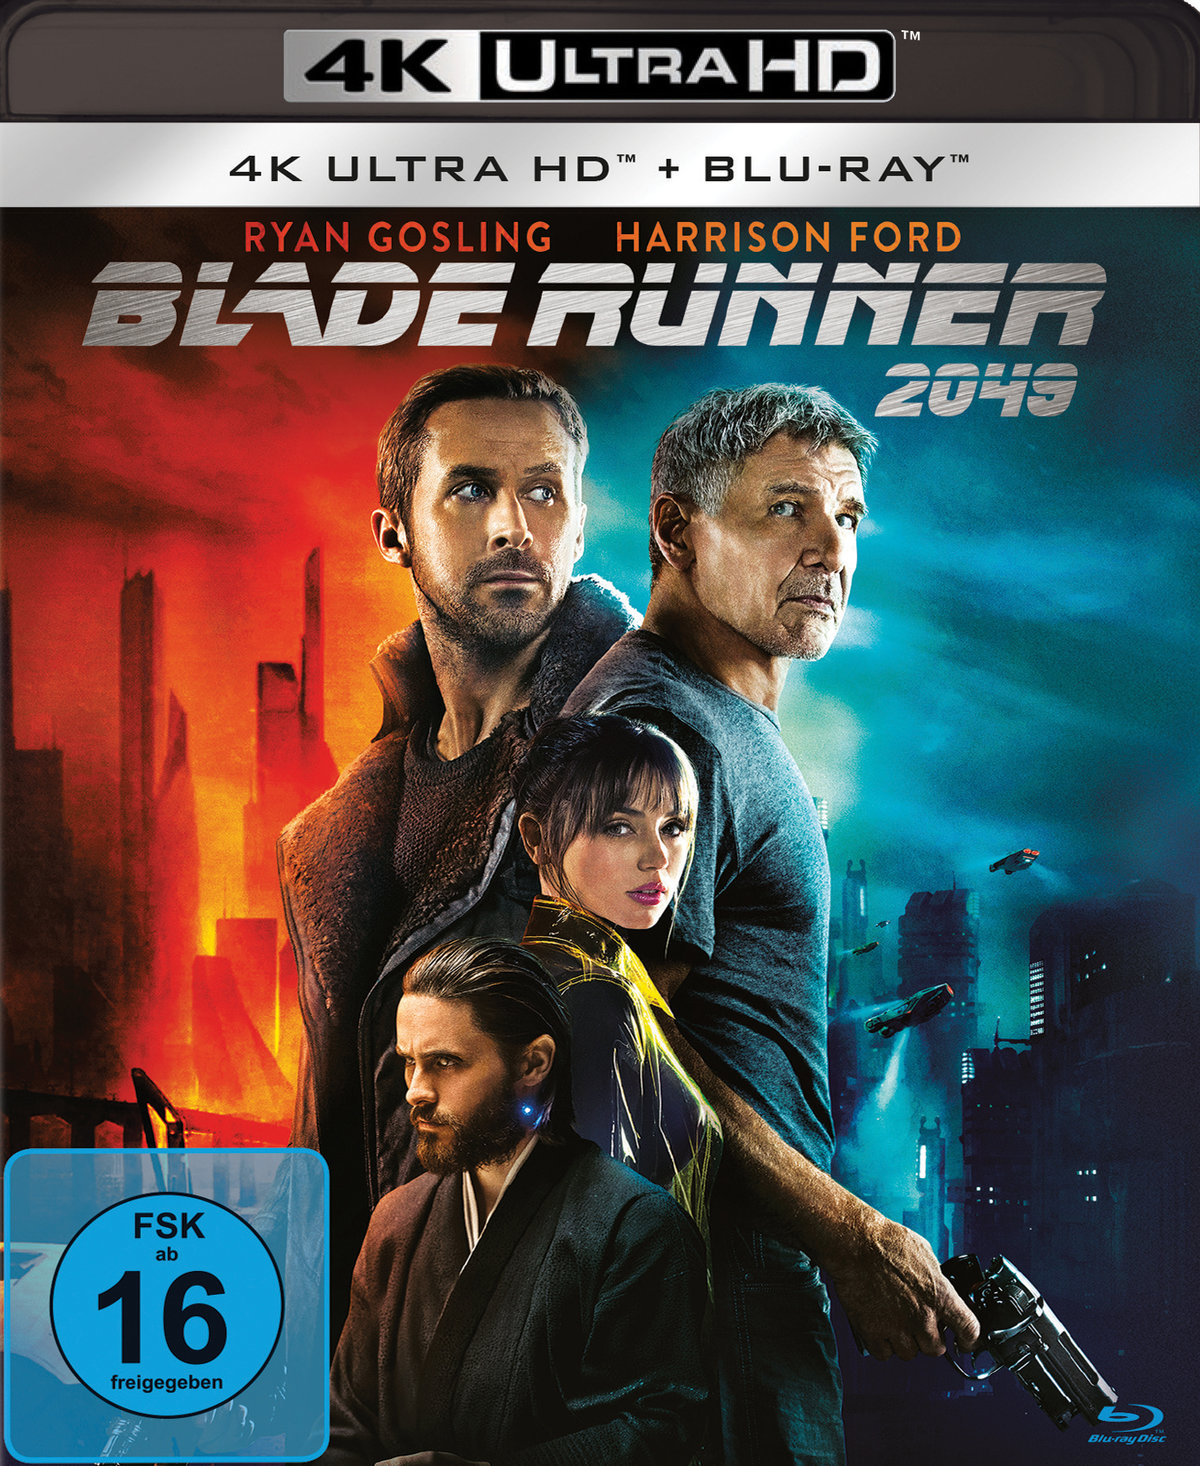 Blade Runner 2049 4K (2017) - (4K Ultra HD & Blu-ray)